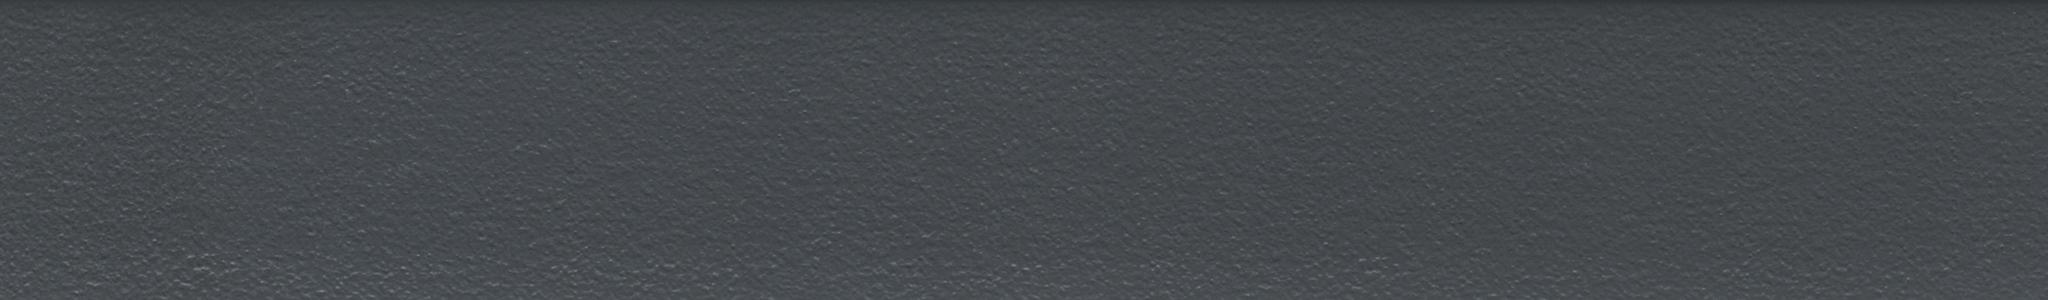 HU 17190 ABS Kante UNI Grau feinperl 107